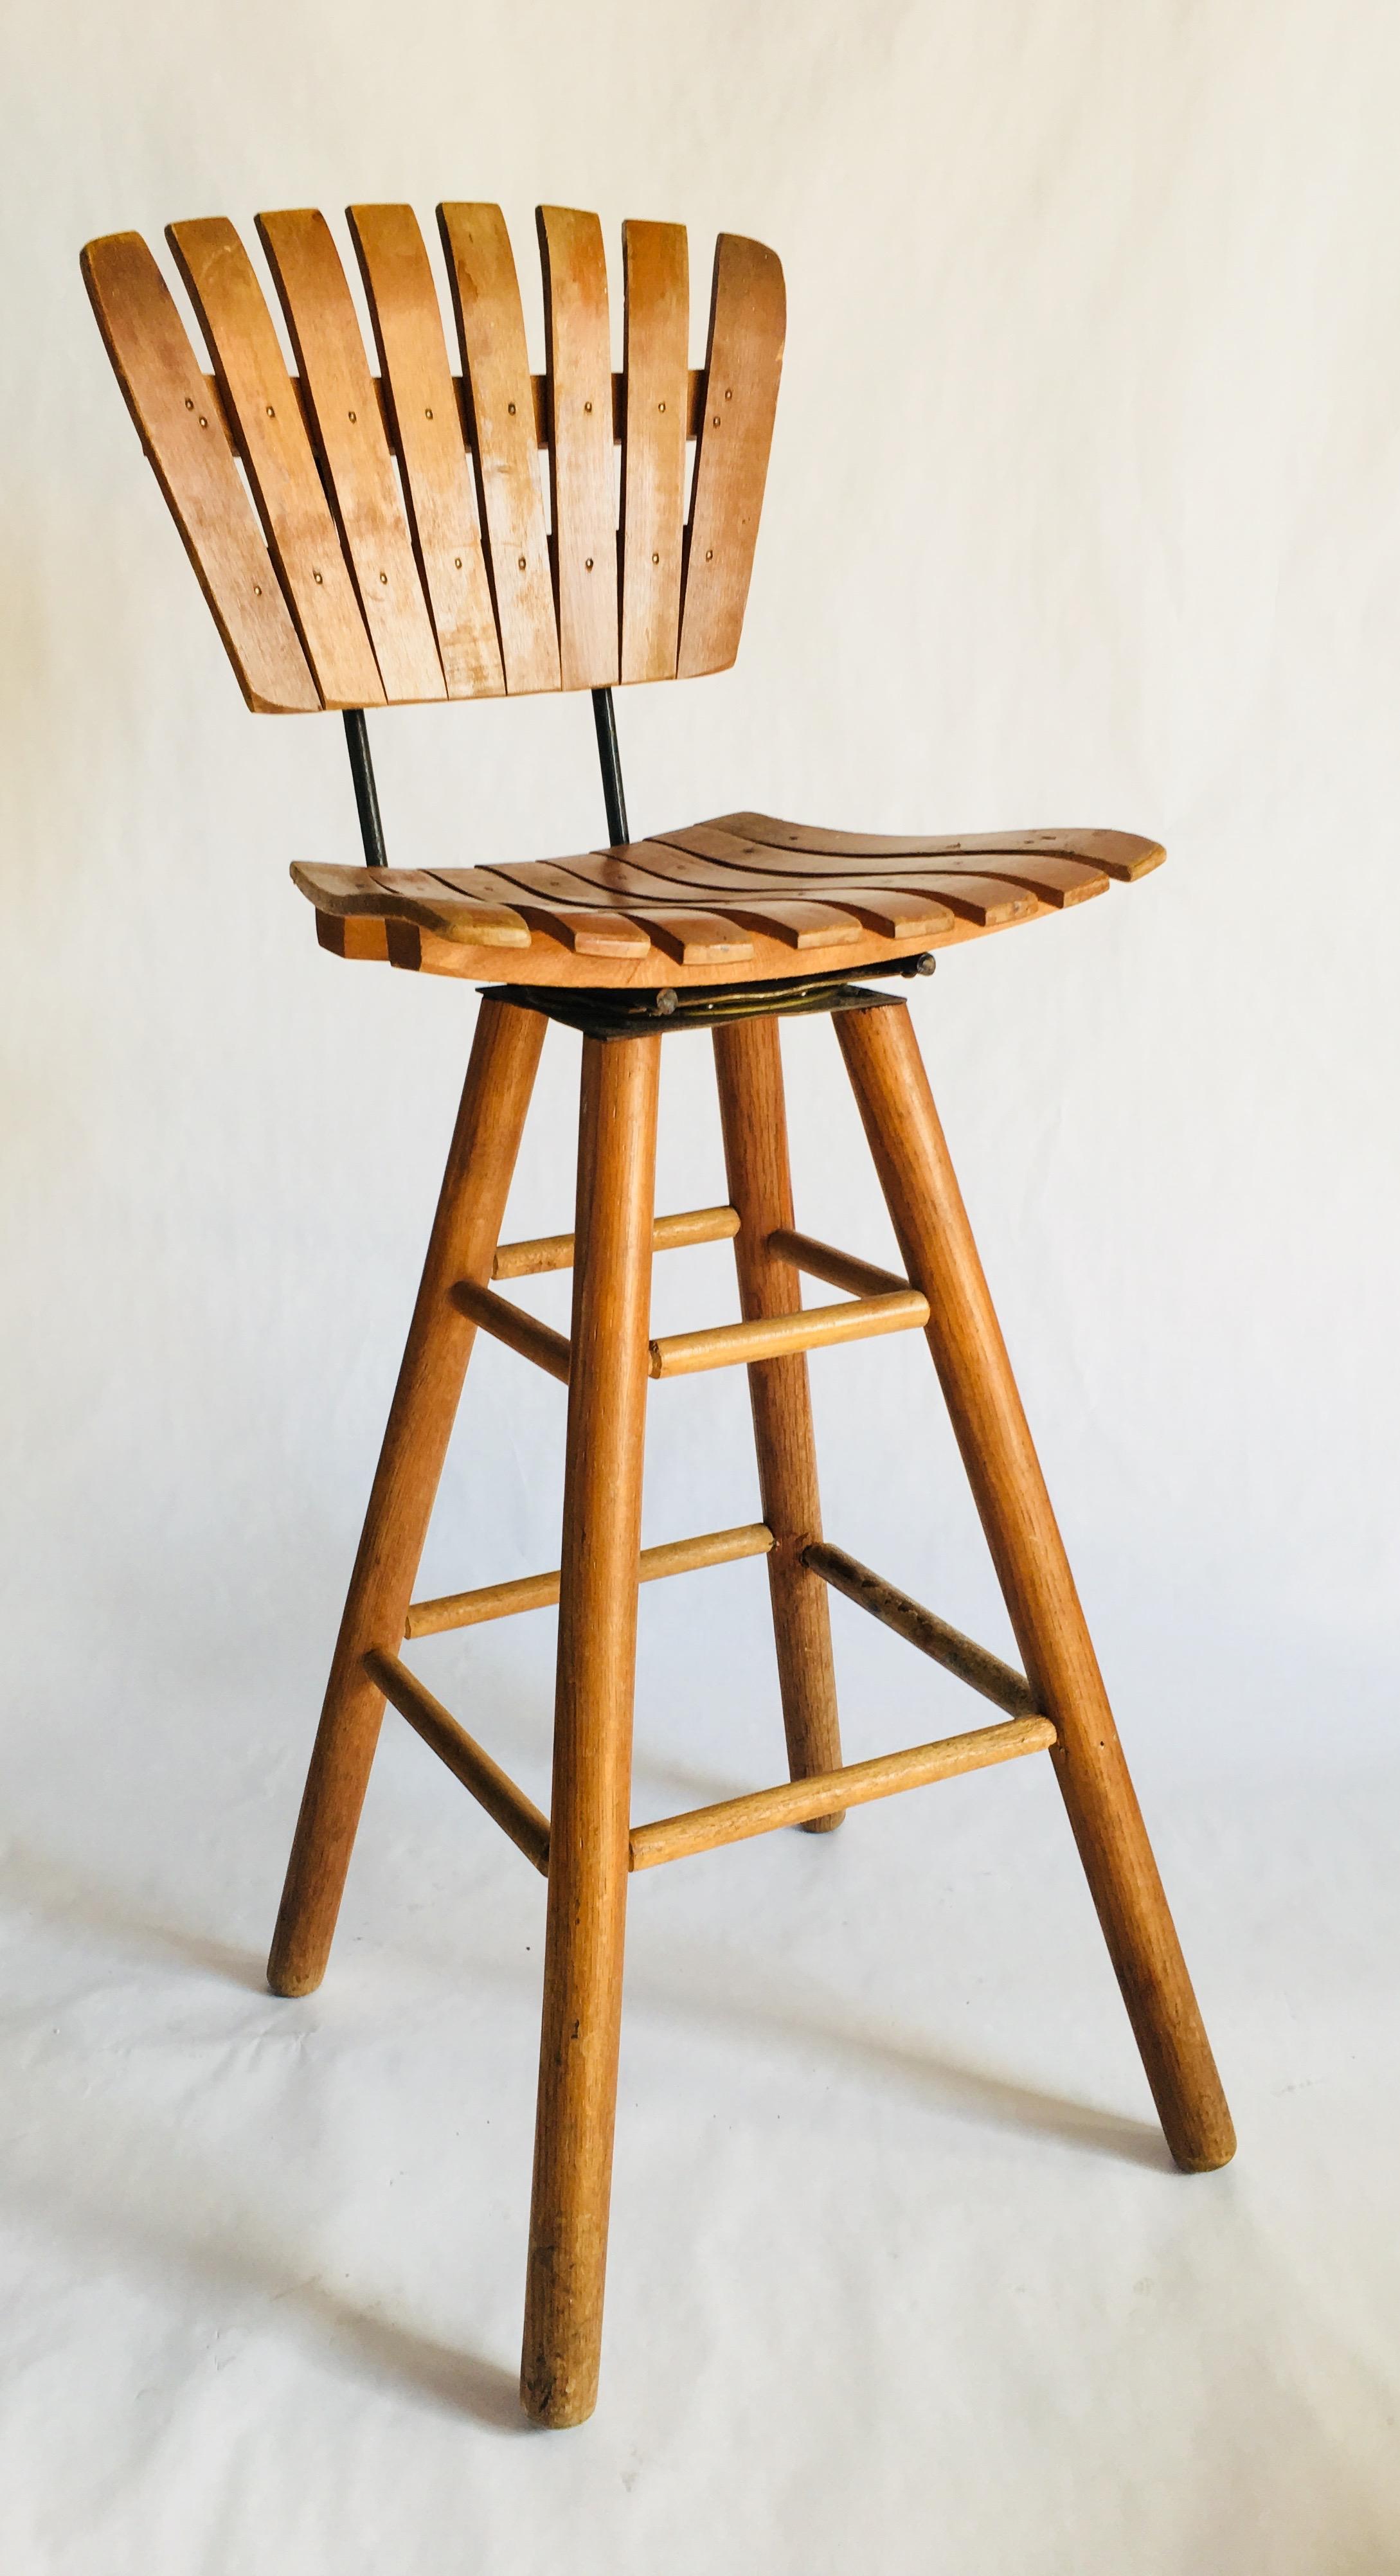 Fantastic Mid Century Slat Wooden Bar Stool With Wood Swivel Base Kyla Coburn Designs Commercial Restaurant Hospitality Cjindustries Chair Design For Home Cjindustriesco